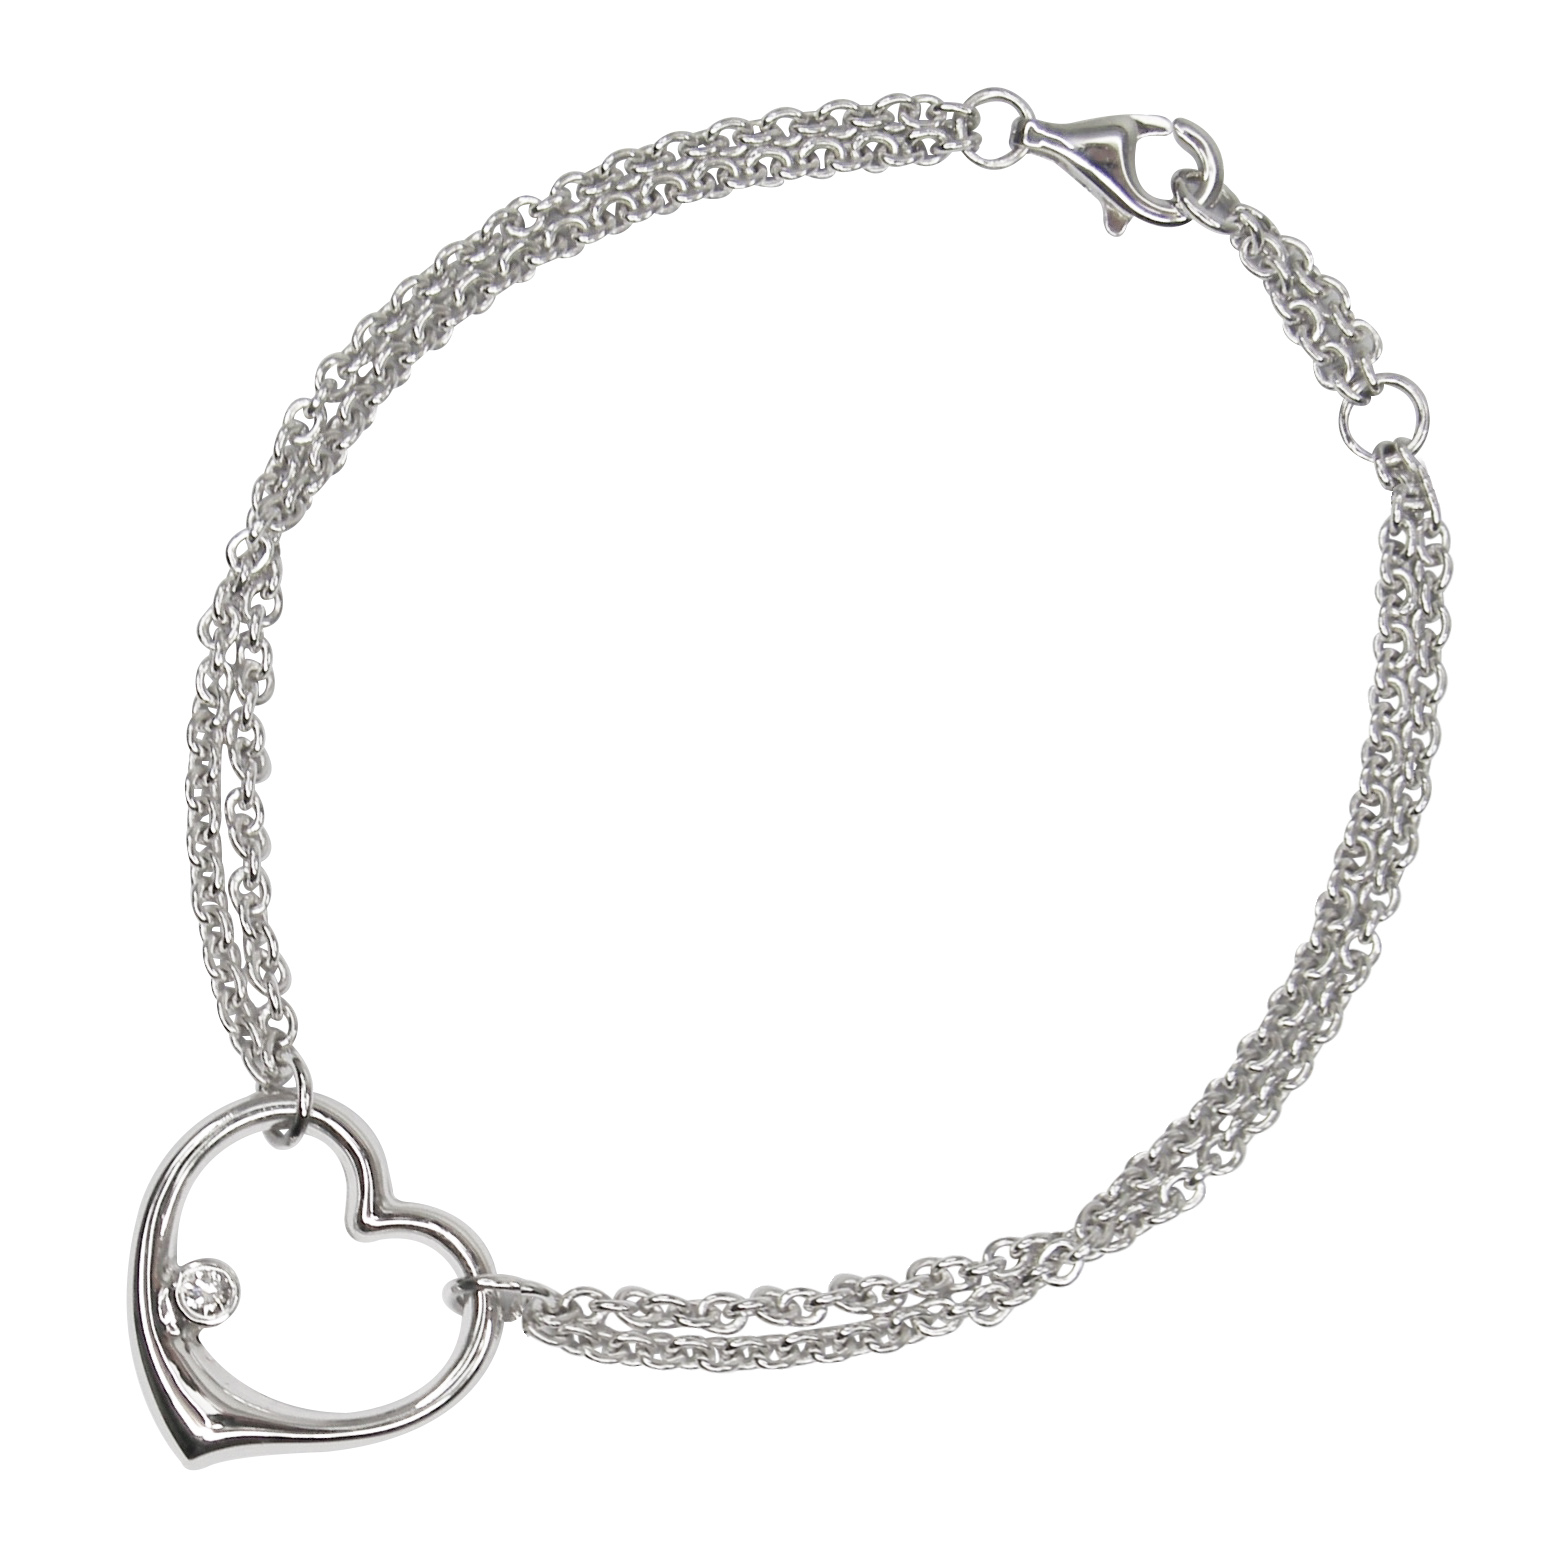 DOUBLE CHAIN OPEN HEART BRACELET CLUSTER DIAMOND PENDANT BESPOKE FINE JEWELLERY BY SHAHINA HATTA